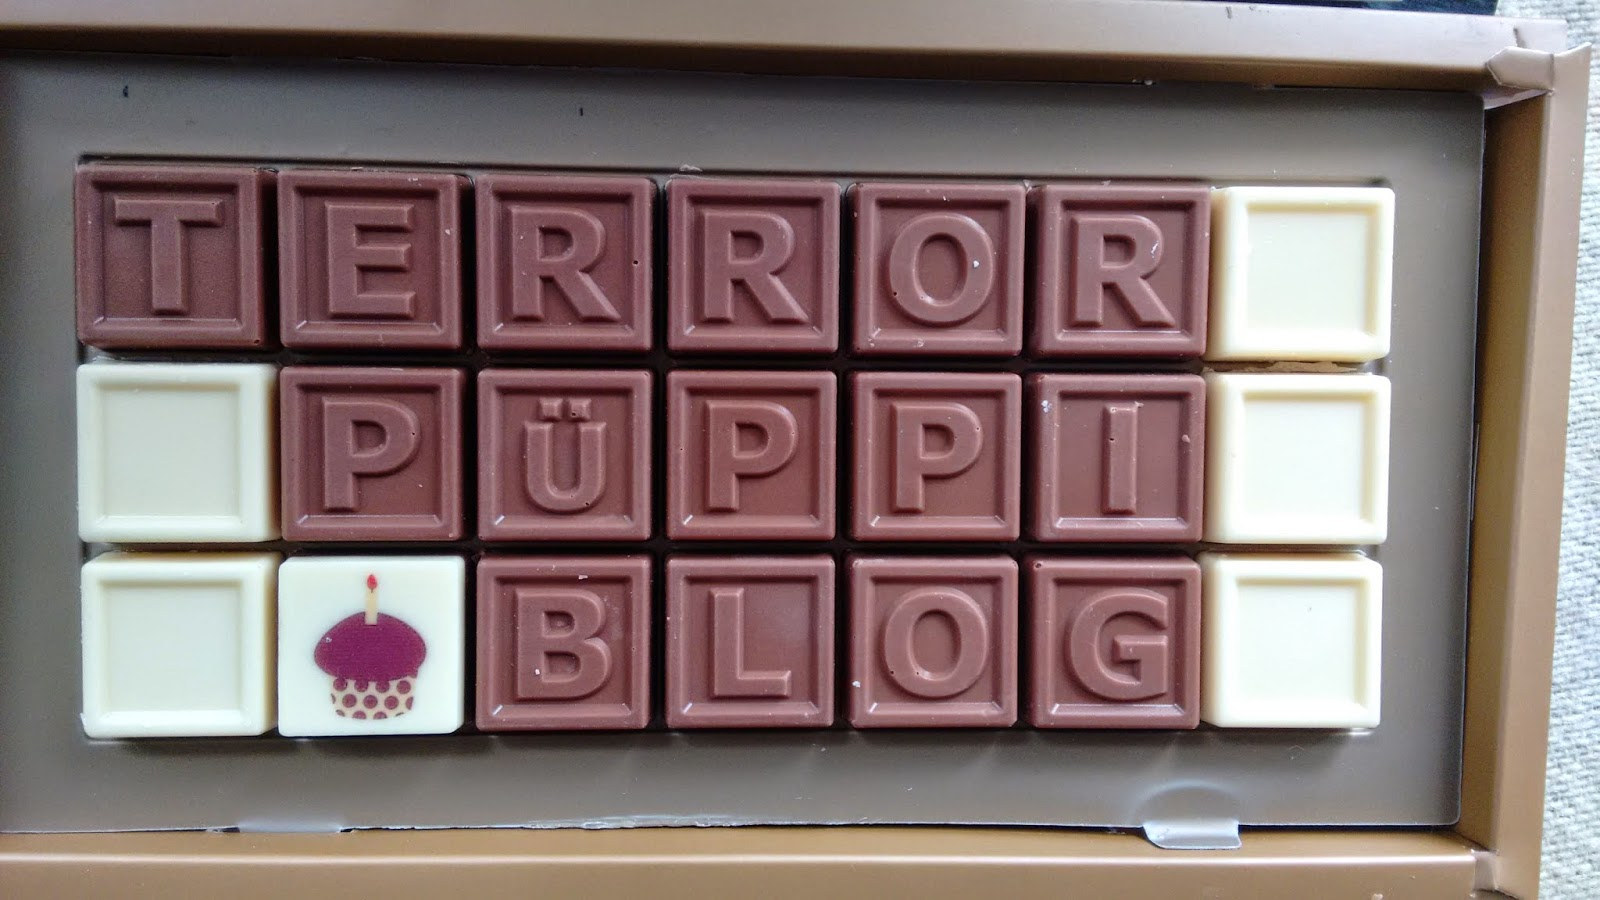 Schokolade mit dem namen Terrorpüppi Blog